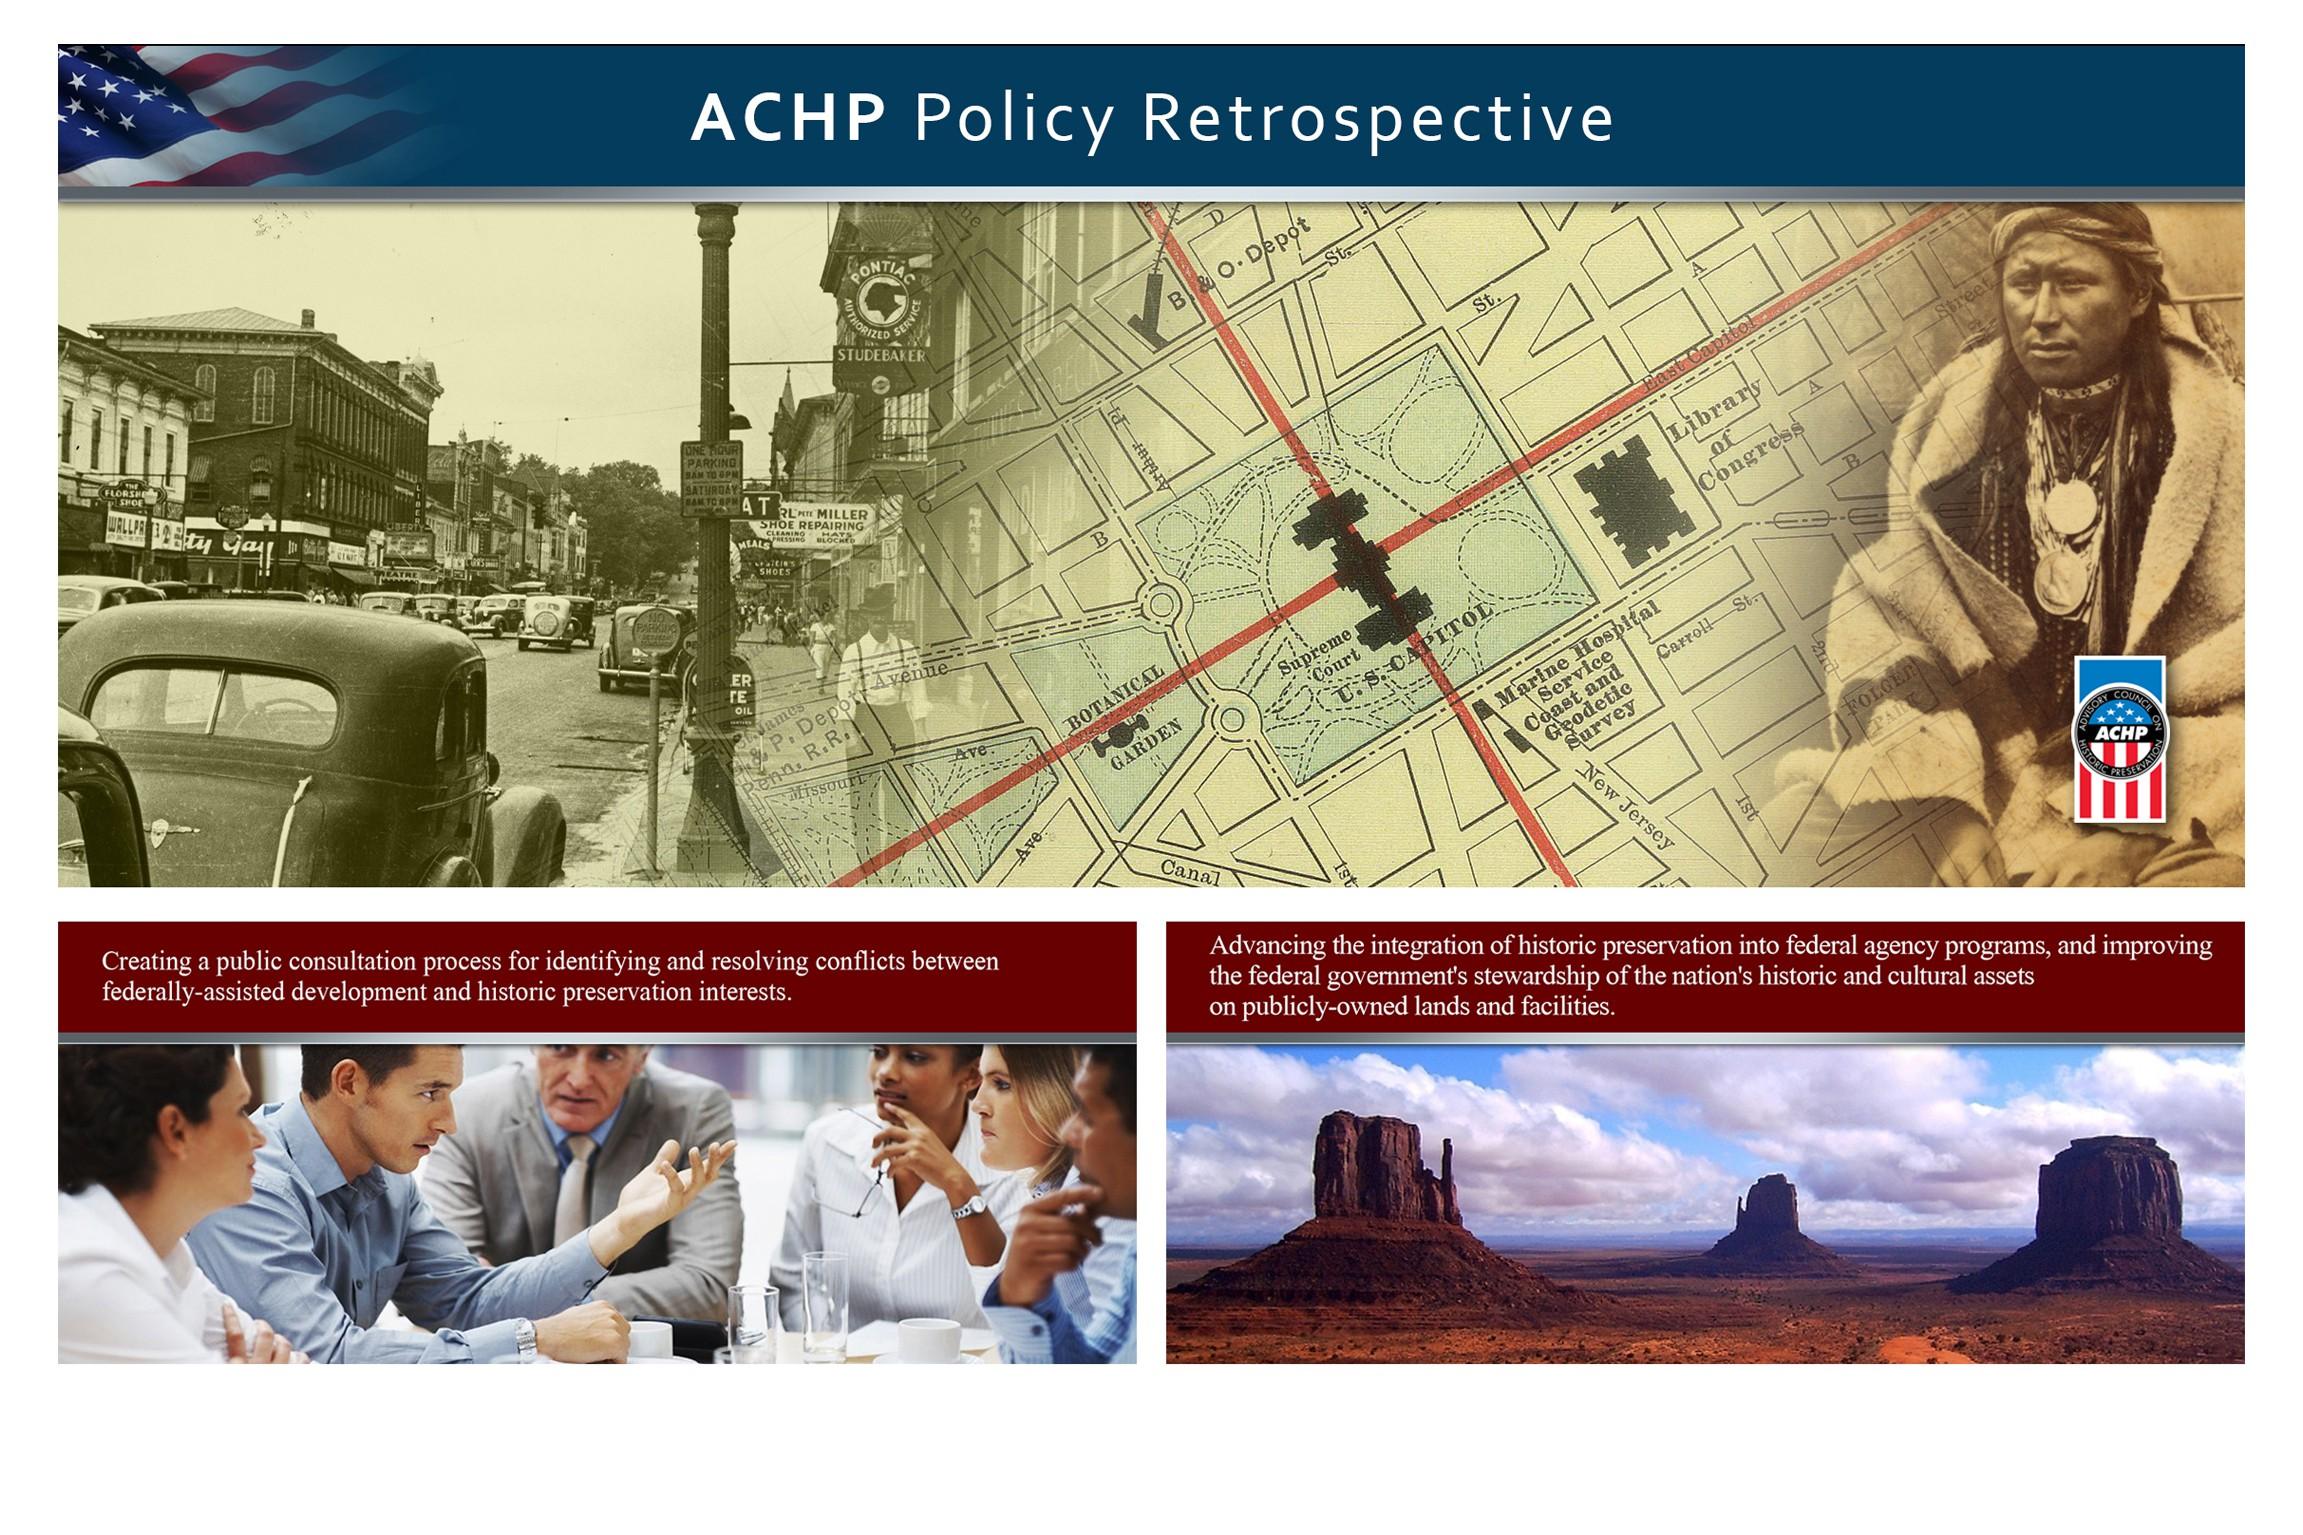 ACHP Retrospective Themed Graphics